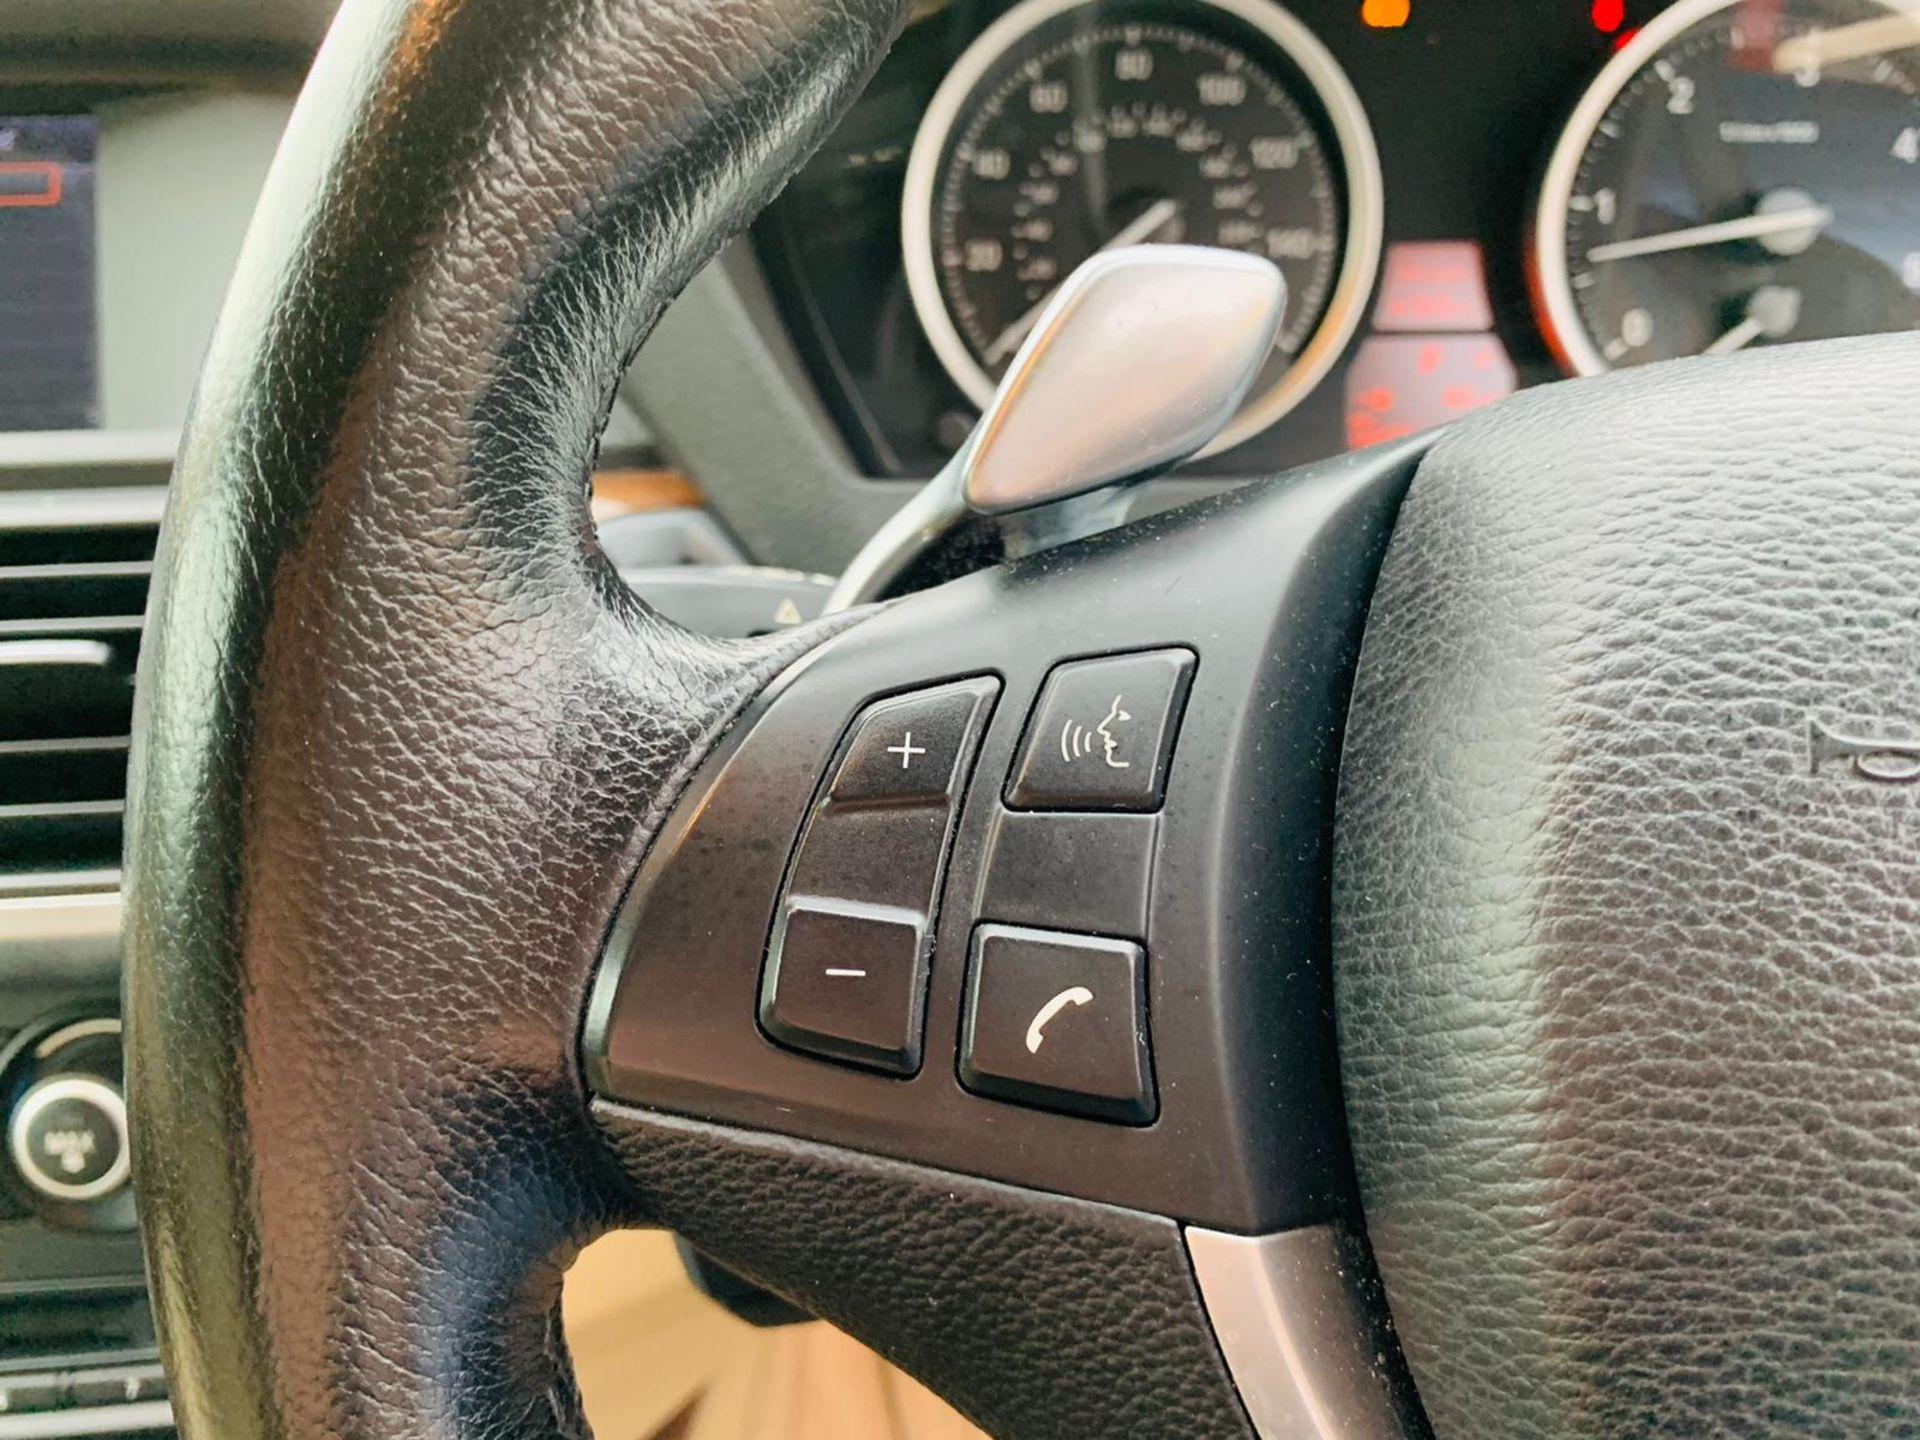 Reseve Met - BMW X6 xDrive 3.0d Auto - 2014 Reg - Leather Interior -Parking Sensors - Reversing Cam - Image 24 of 30